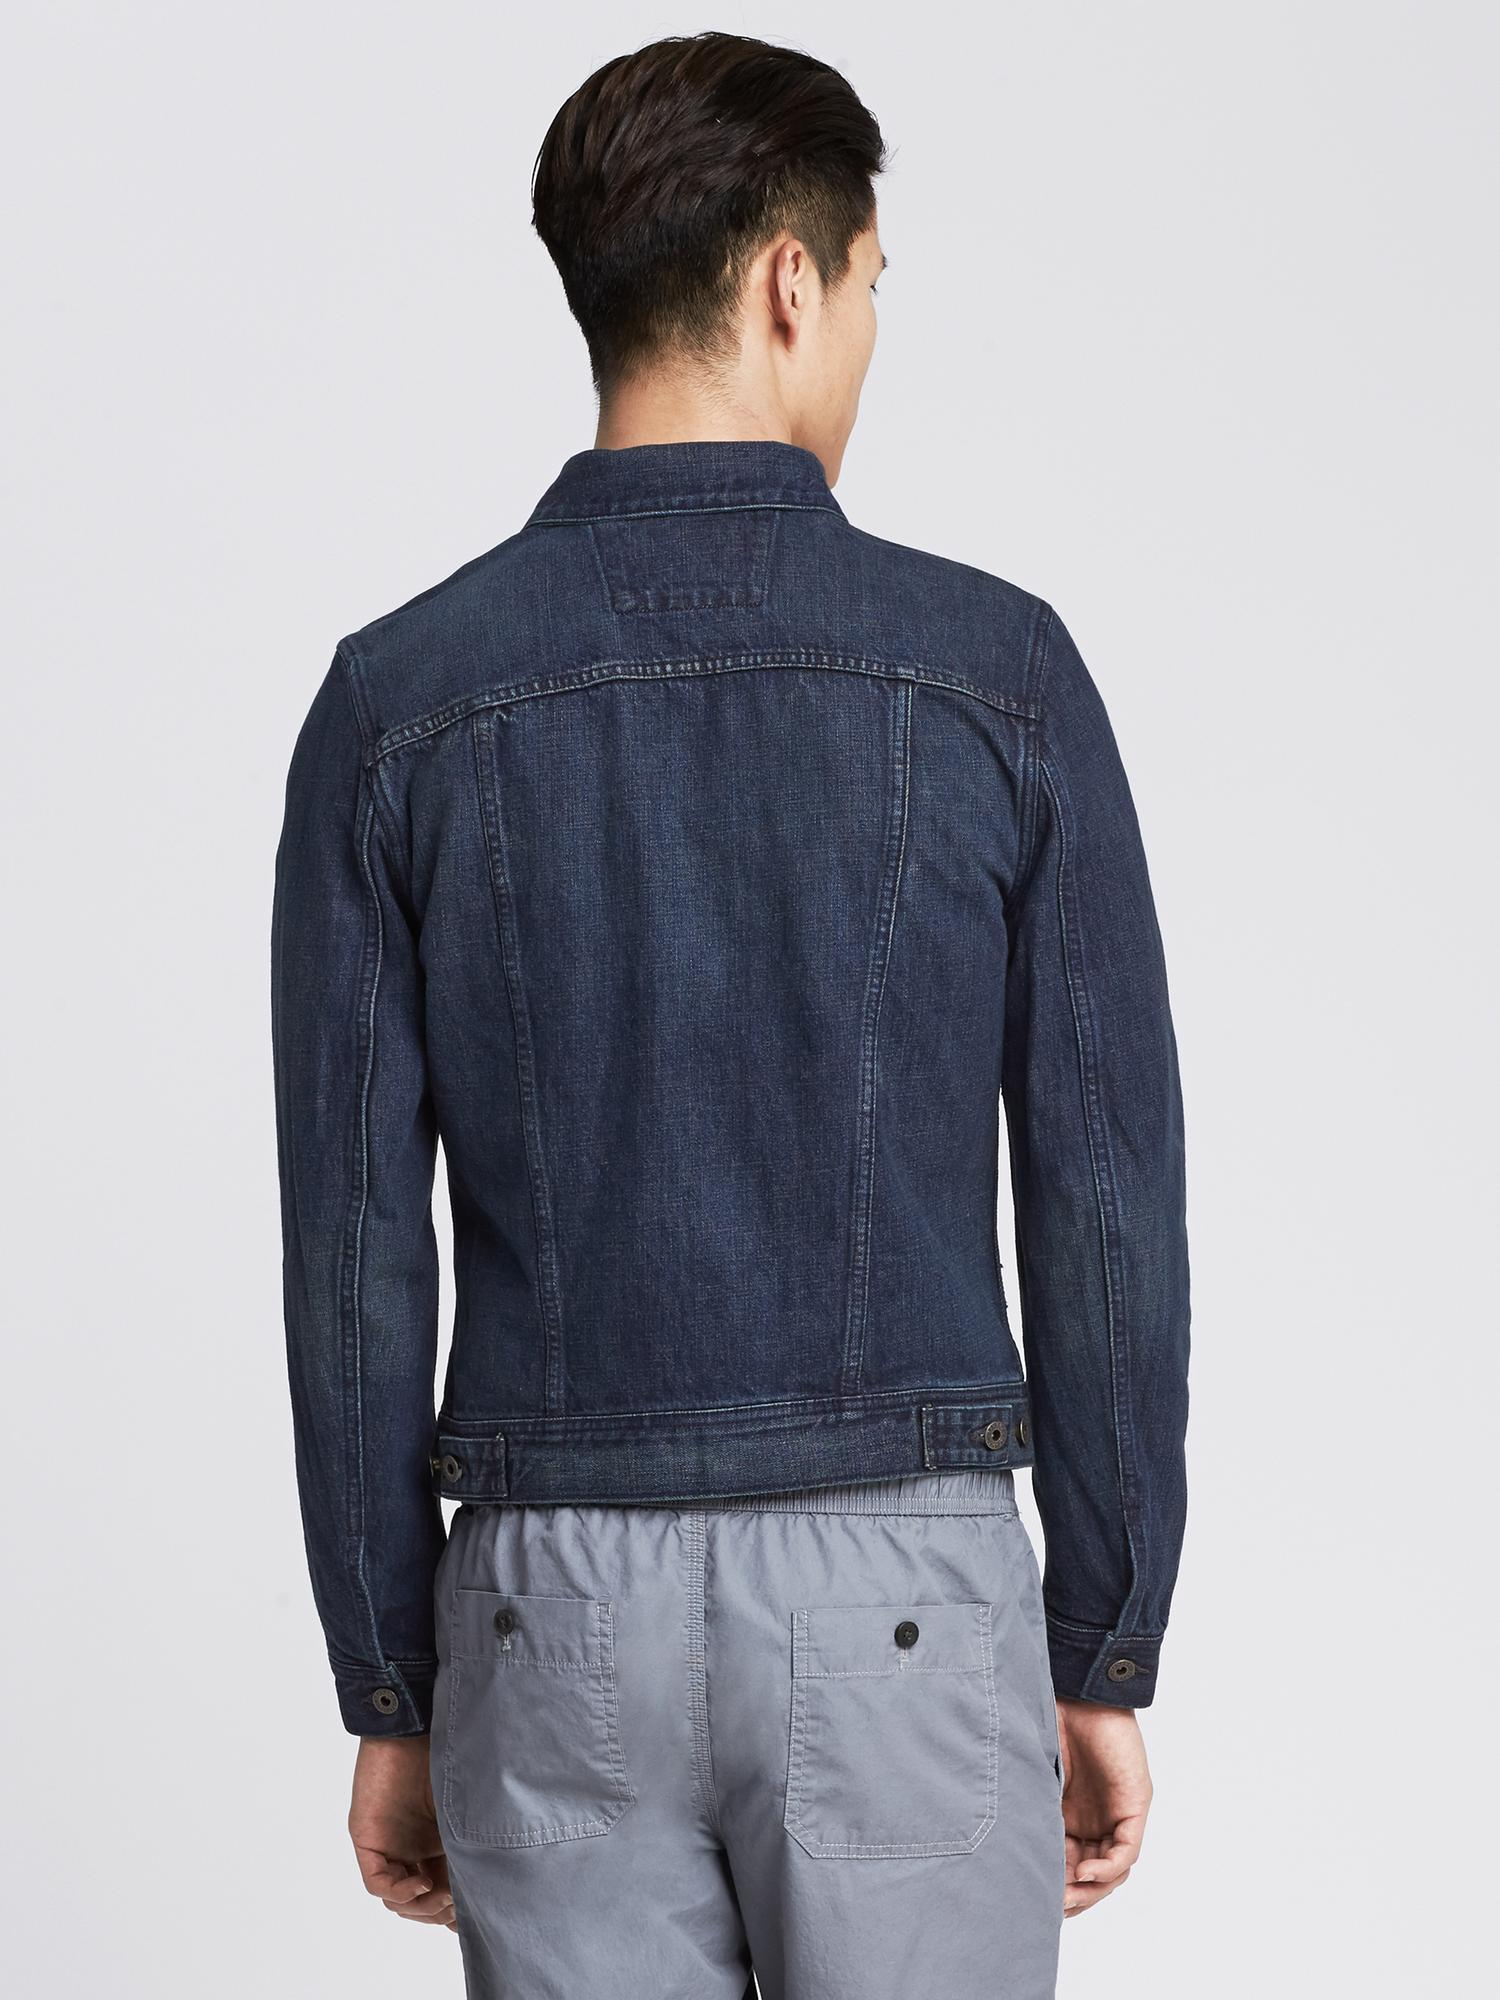 7d3a43daaa0ba Lyst - Banana Republic Indigo Denim Jacket in Blue for Men